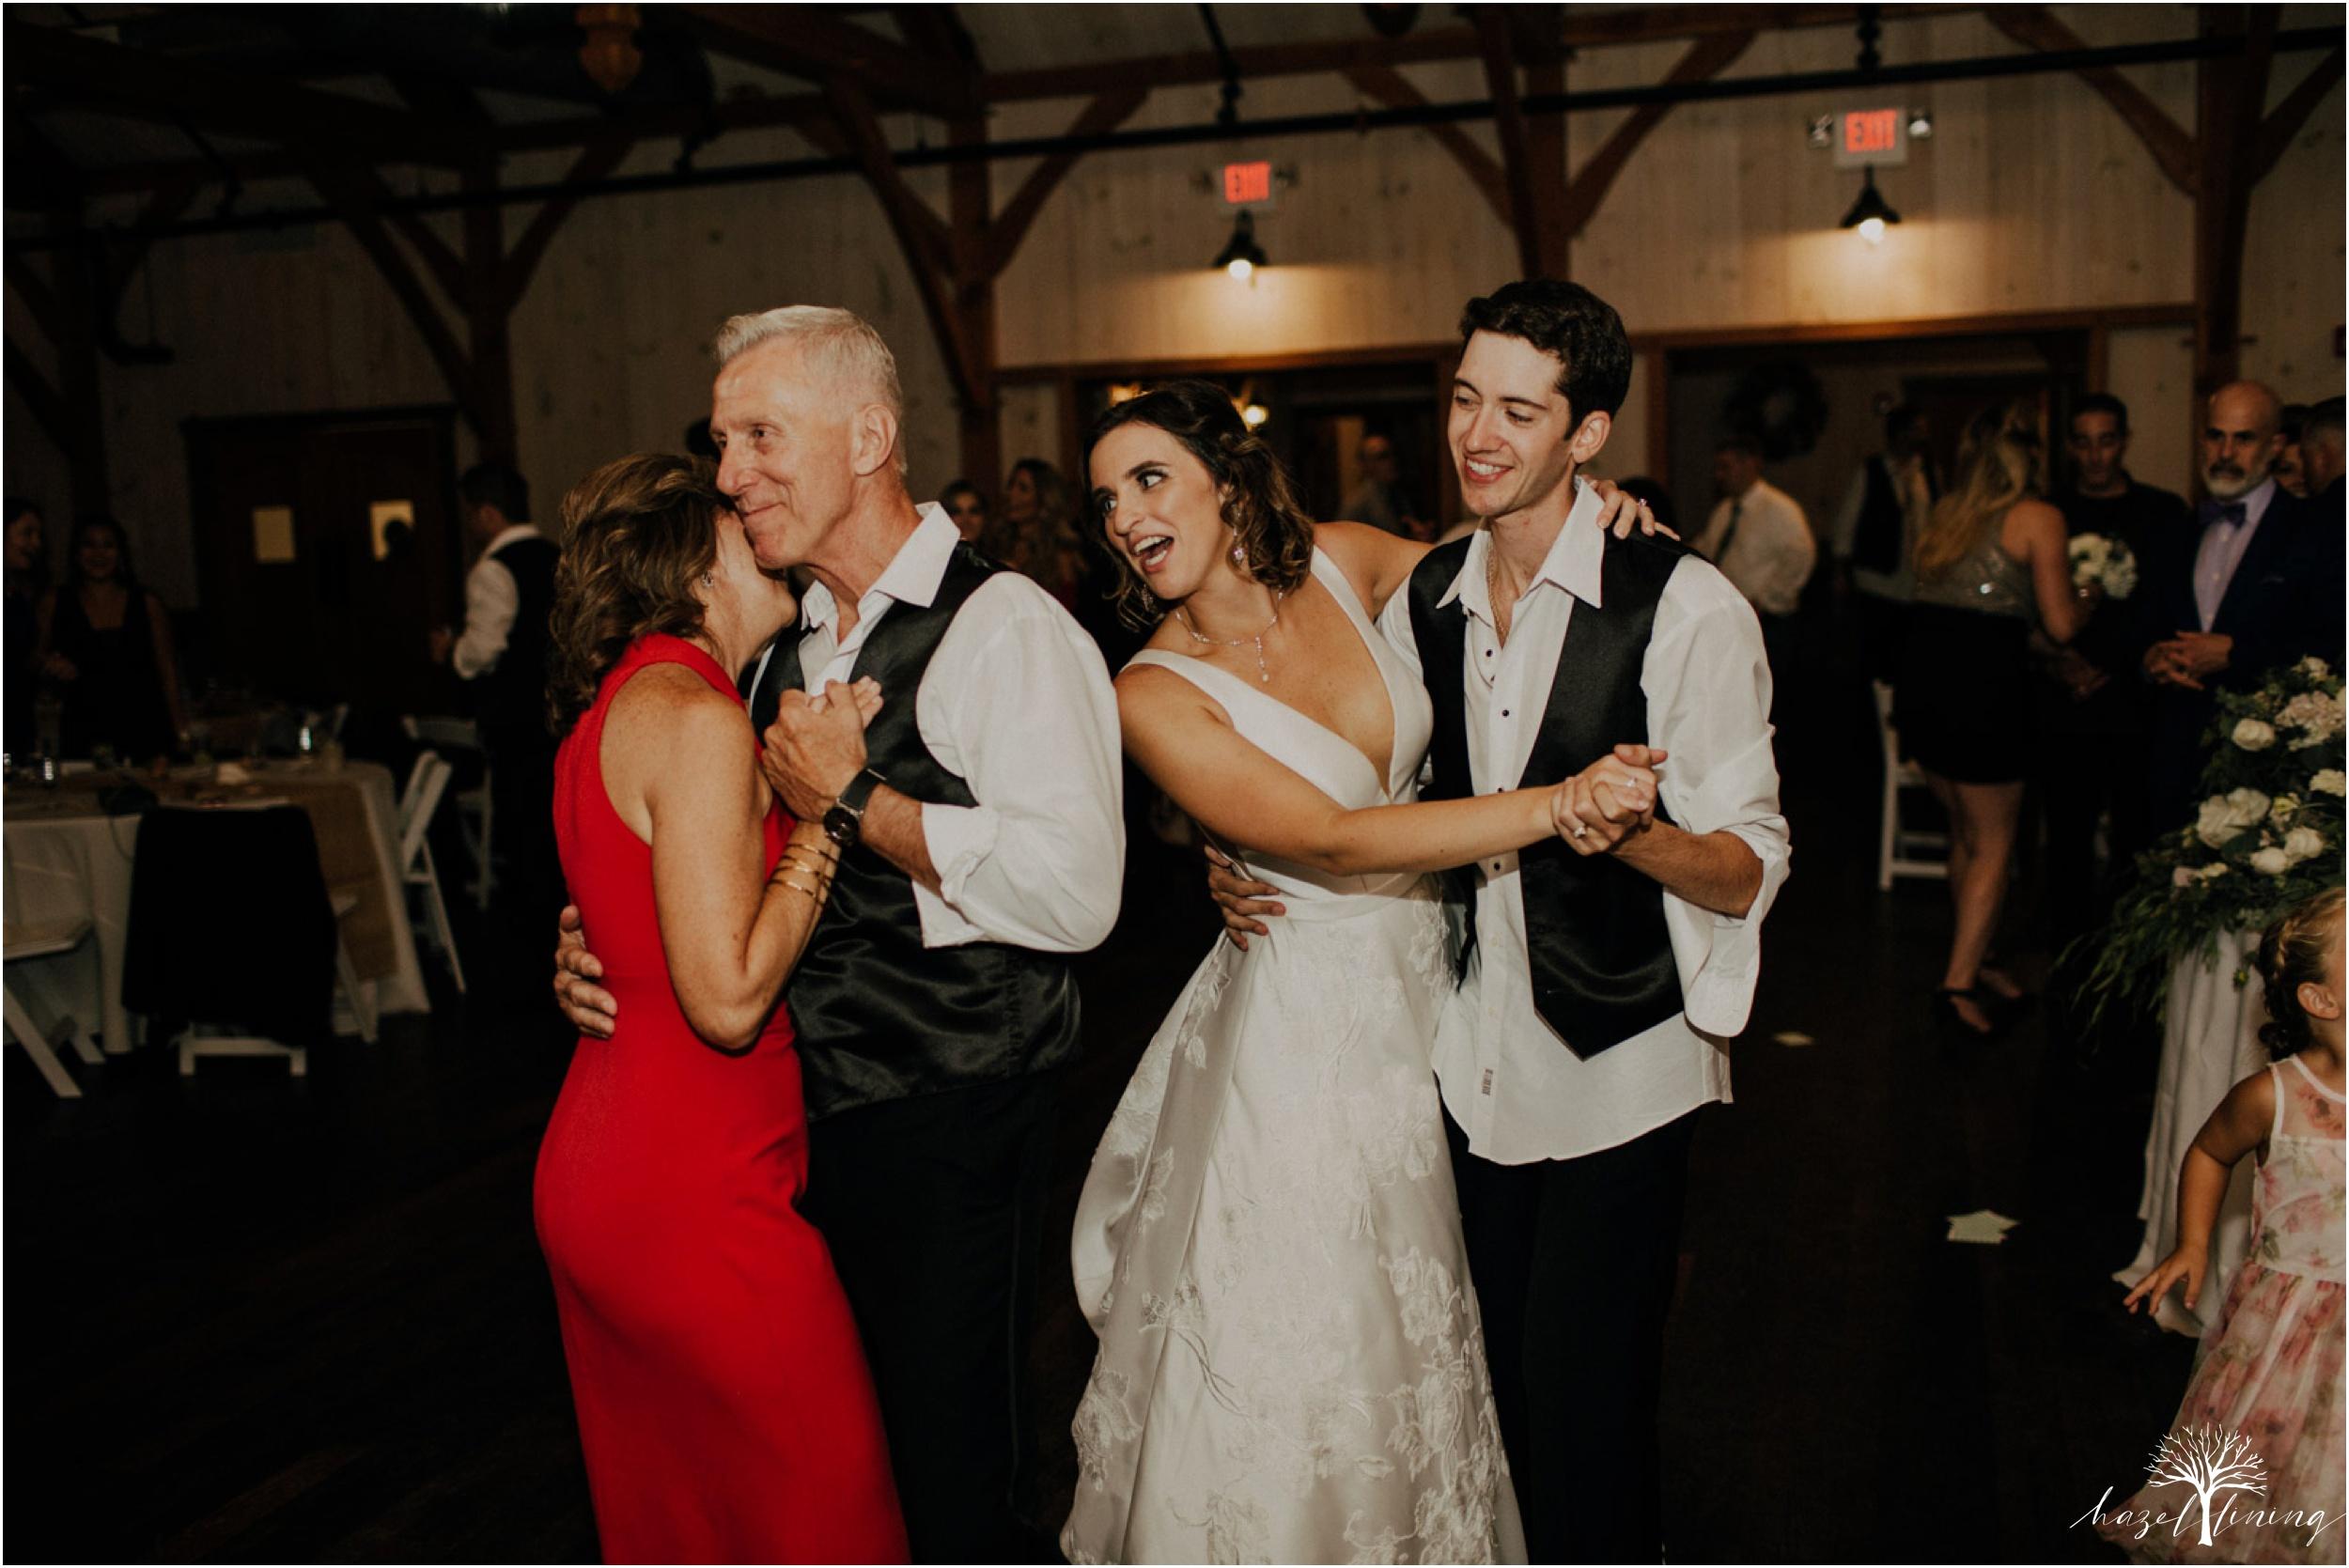 maureen-hepner-anthony-giordano-rose-bank-winery-newtow-pennsylvania-luxury-summer-wedding-hazel-lining-photography-destination-elopement-wedding-engagement-photography_0158.jpg